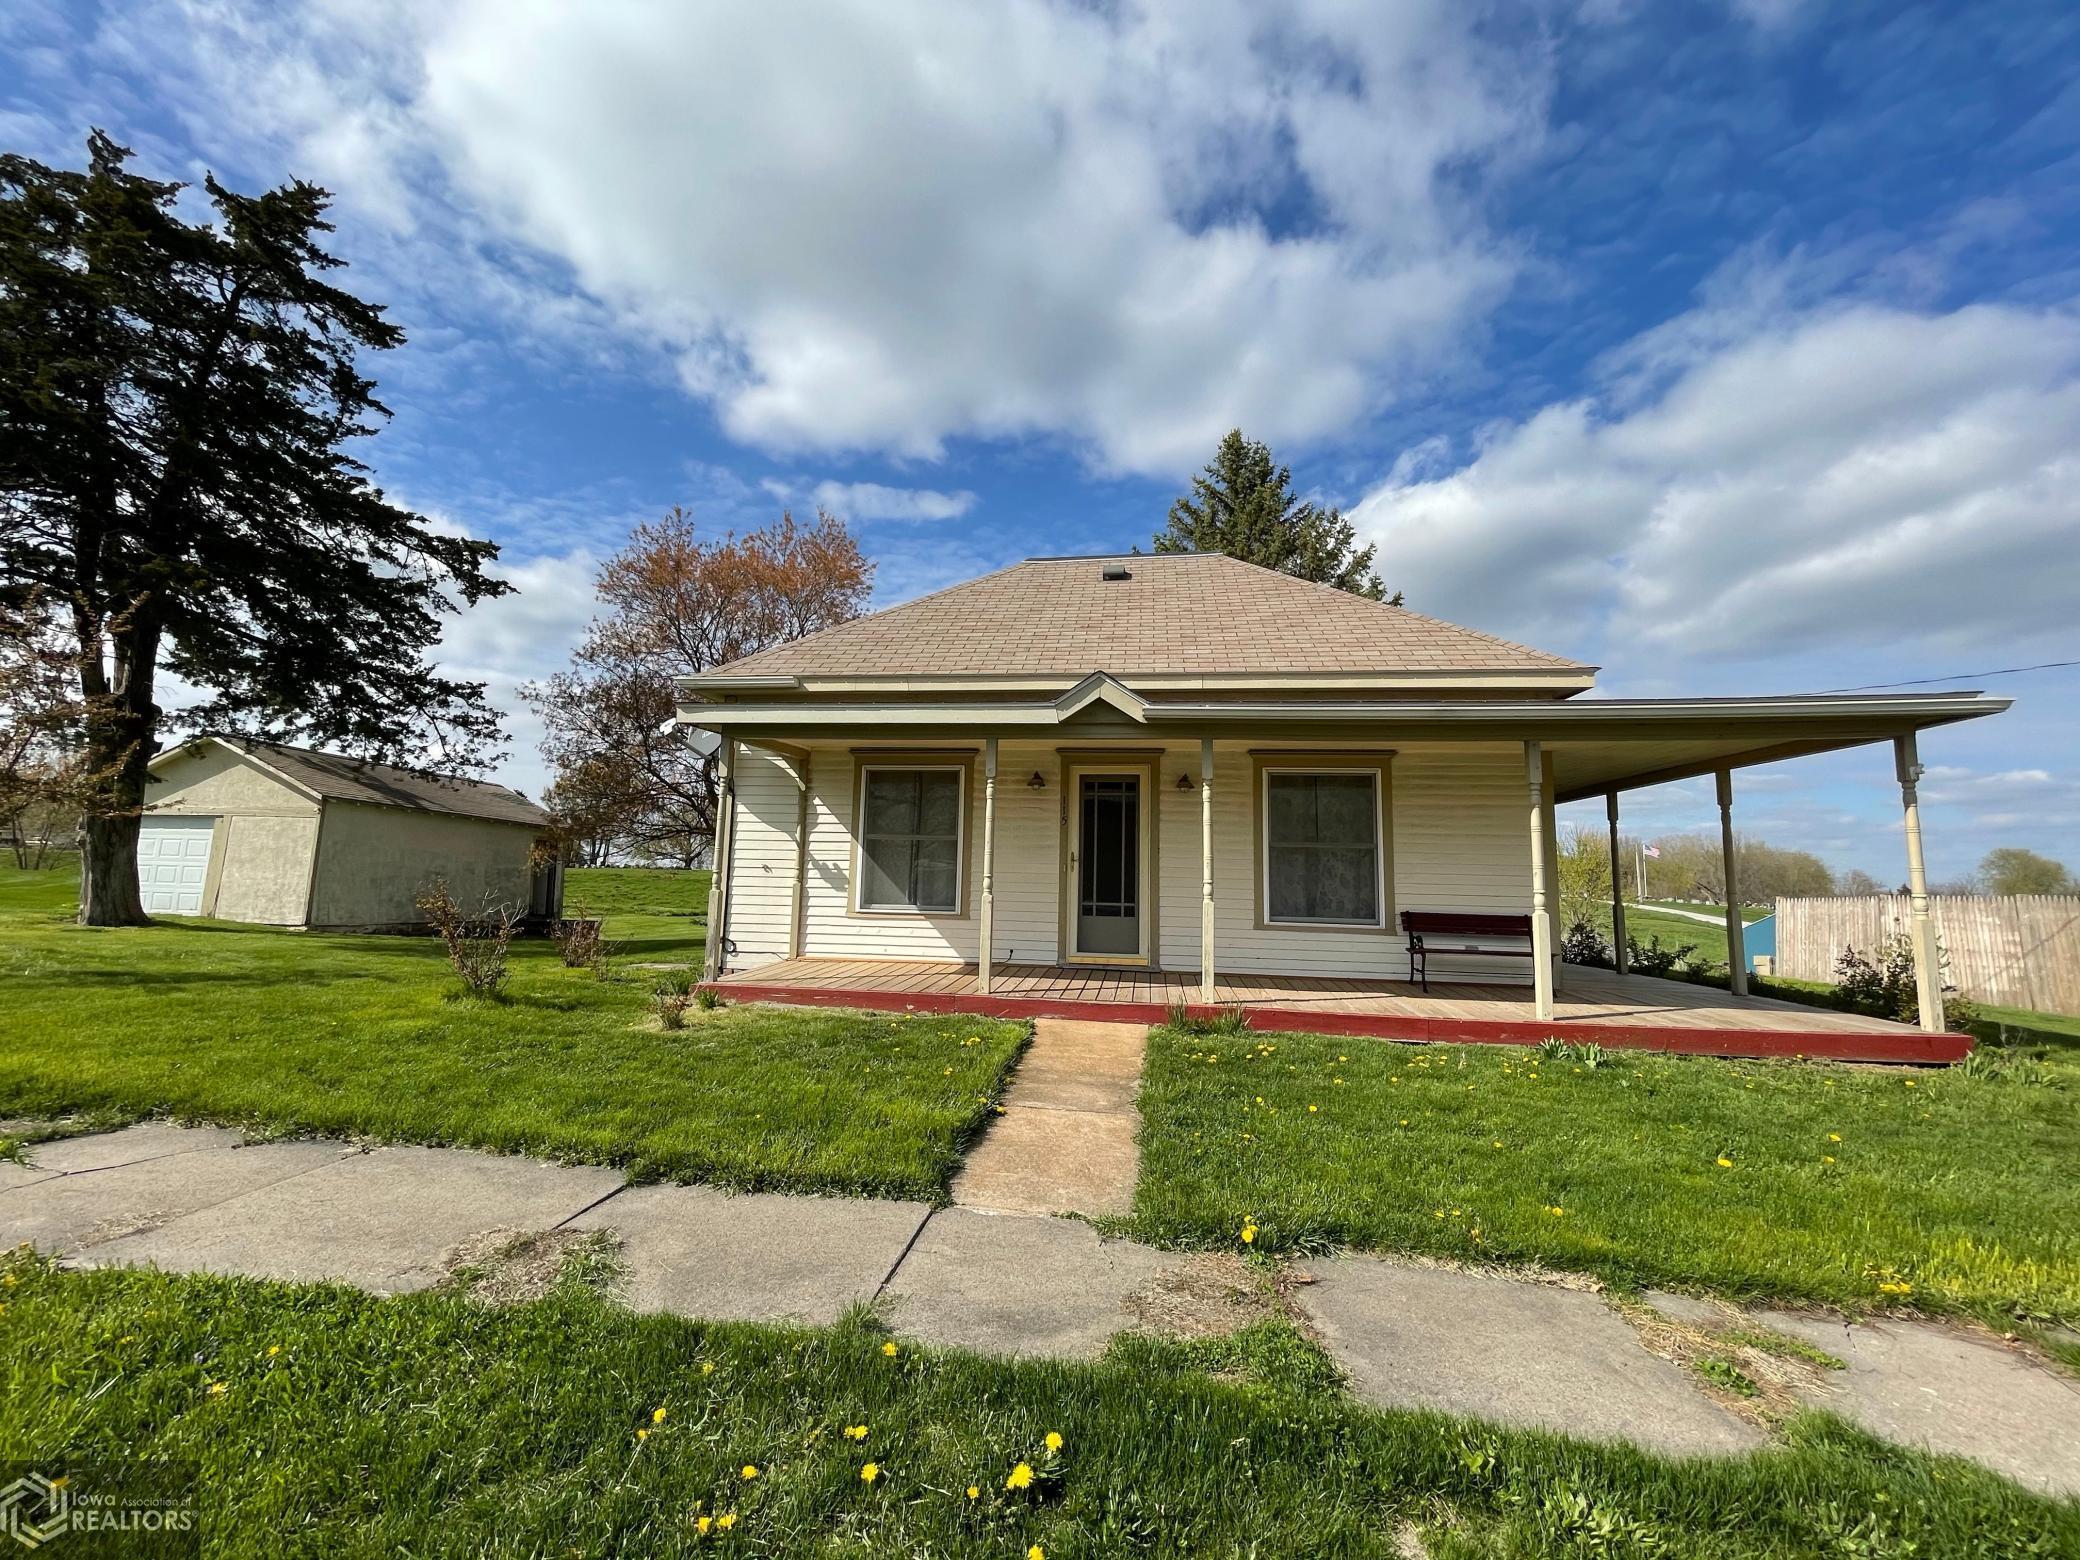 115 Main, Exline, Iowa 52555-8034, 2 Bedrooms Bedrooms, ,1 BathroomBathrooms,Single Family,For Sale,Main,5740728